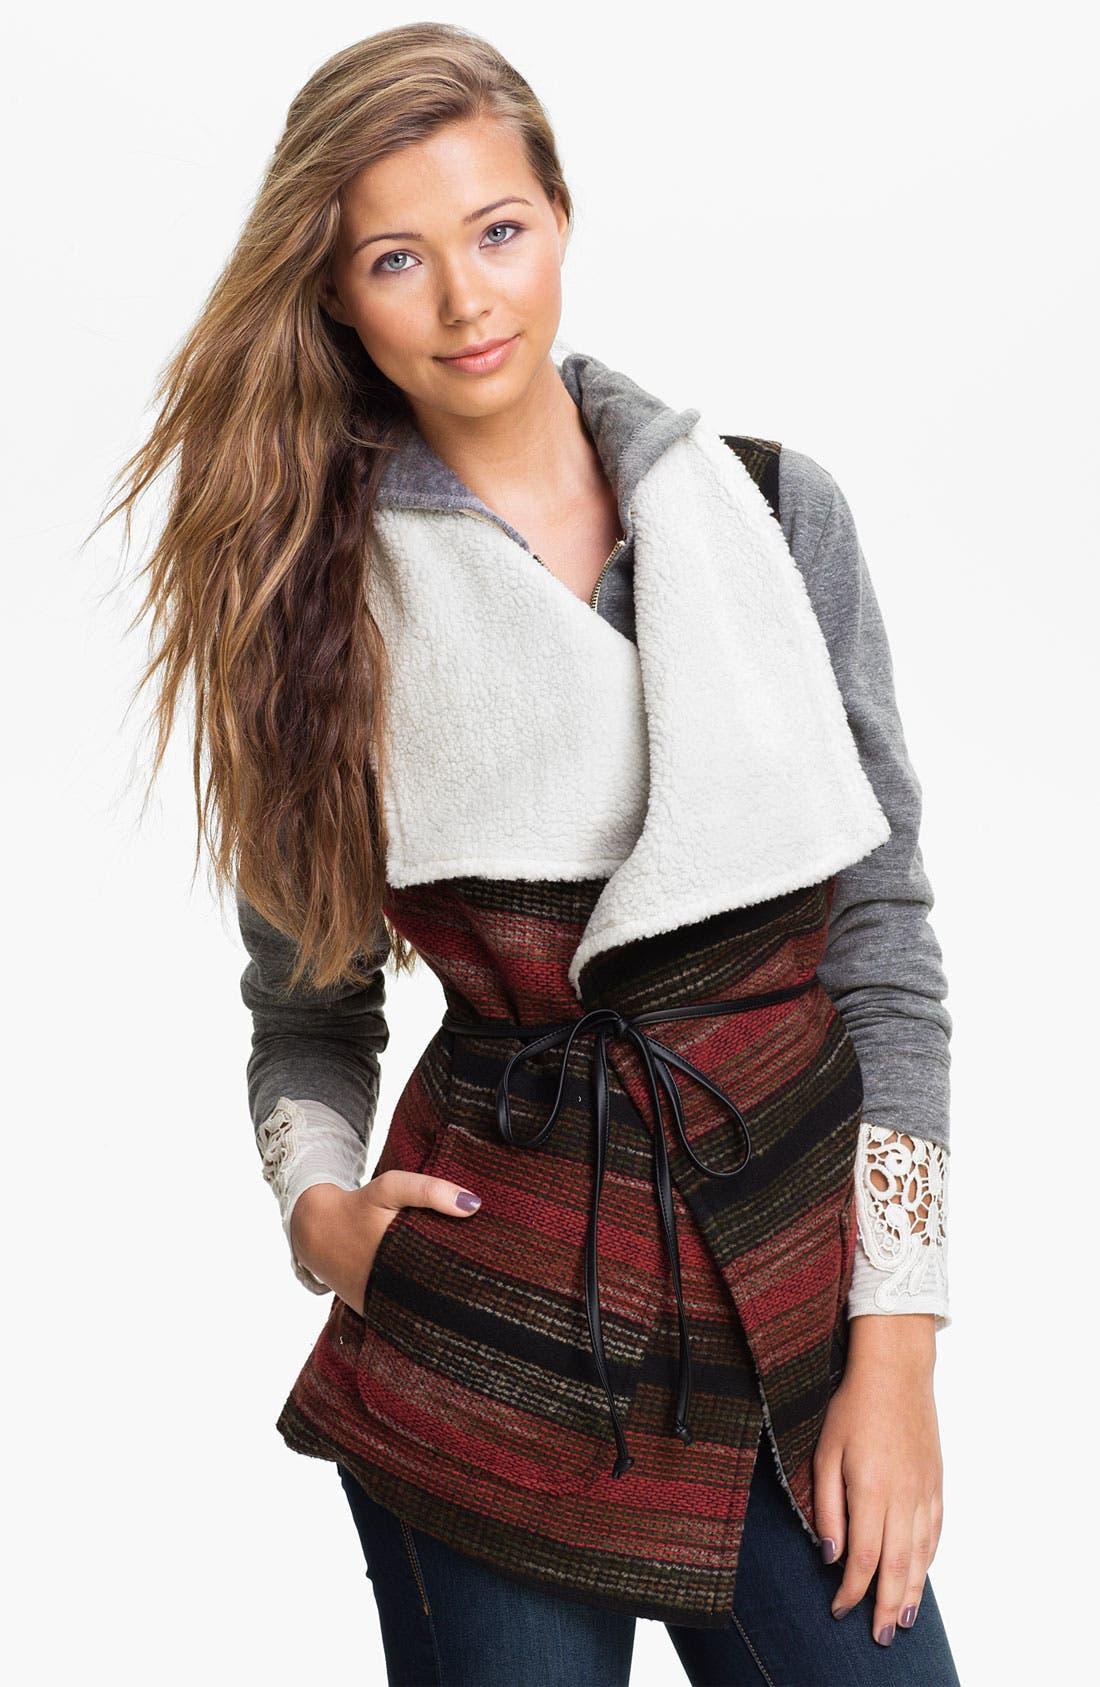 Alternate Image 1 Selected - Jolt Southwestern Blanket Vest (Juniors)